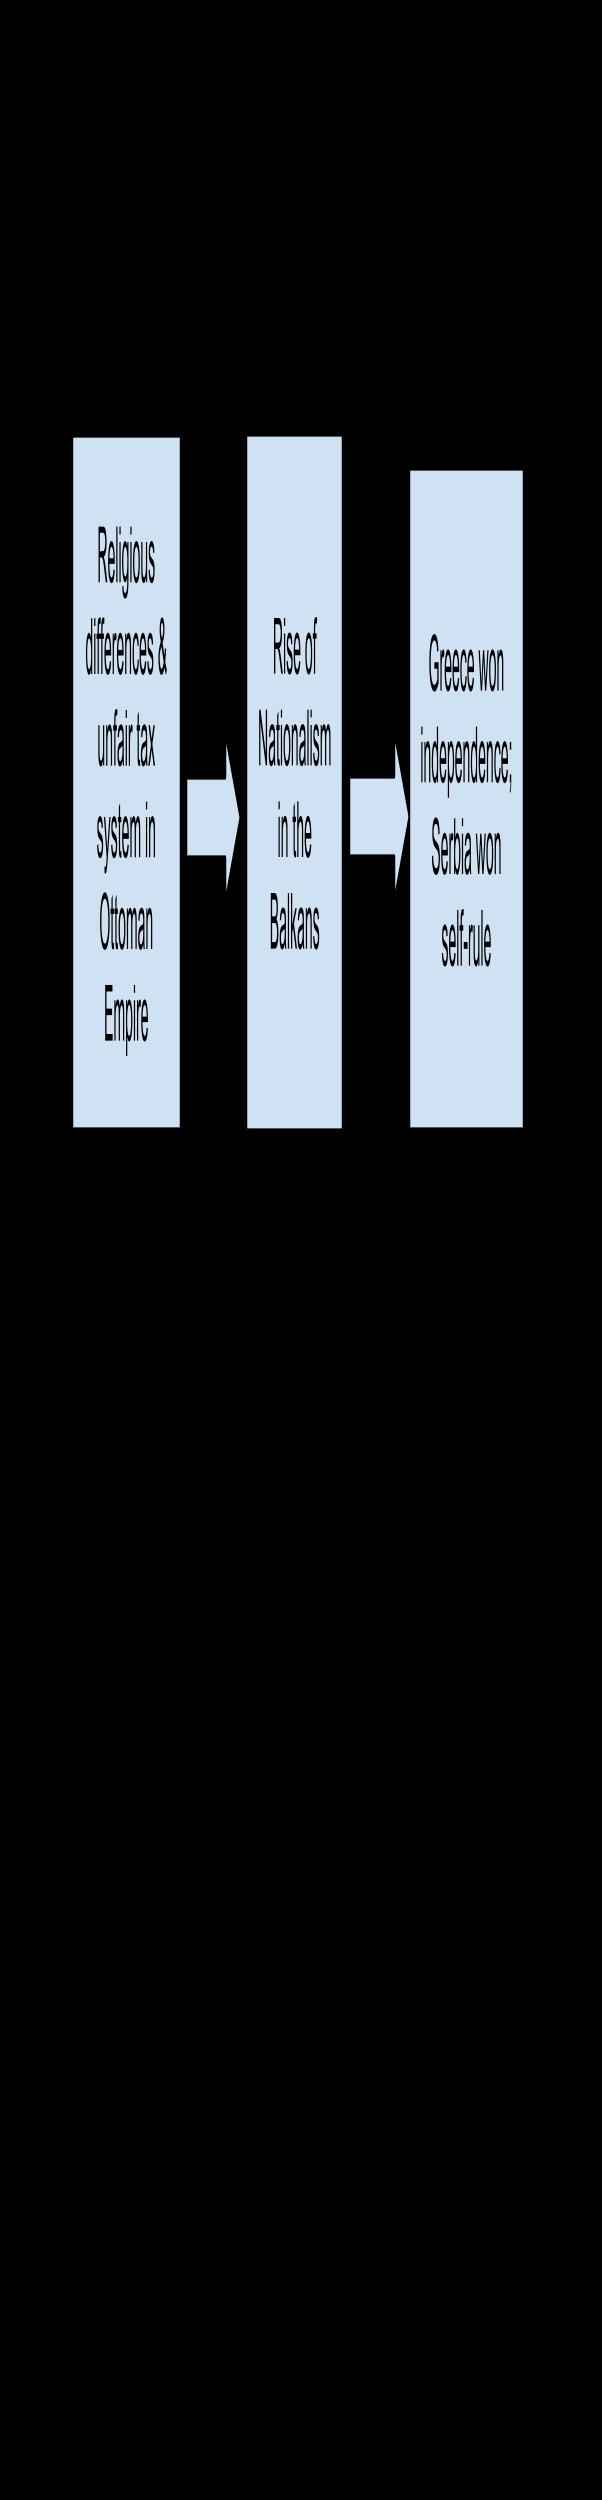 external image image?w=602&h=170&rev=25&ac=1